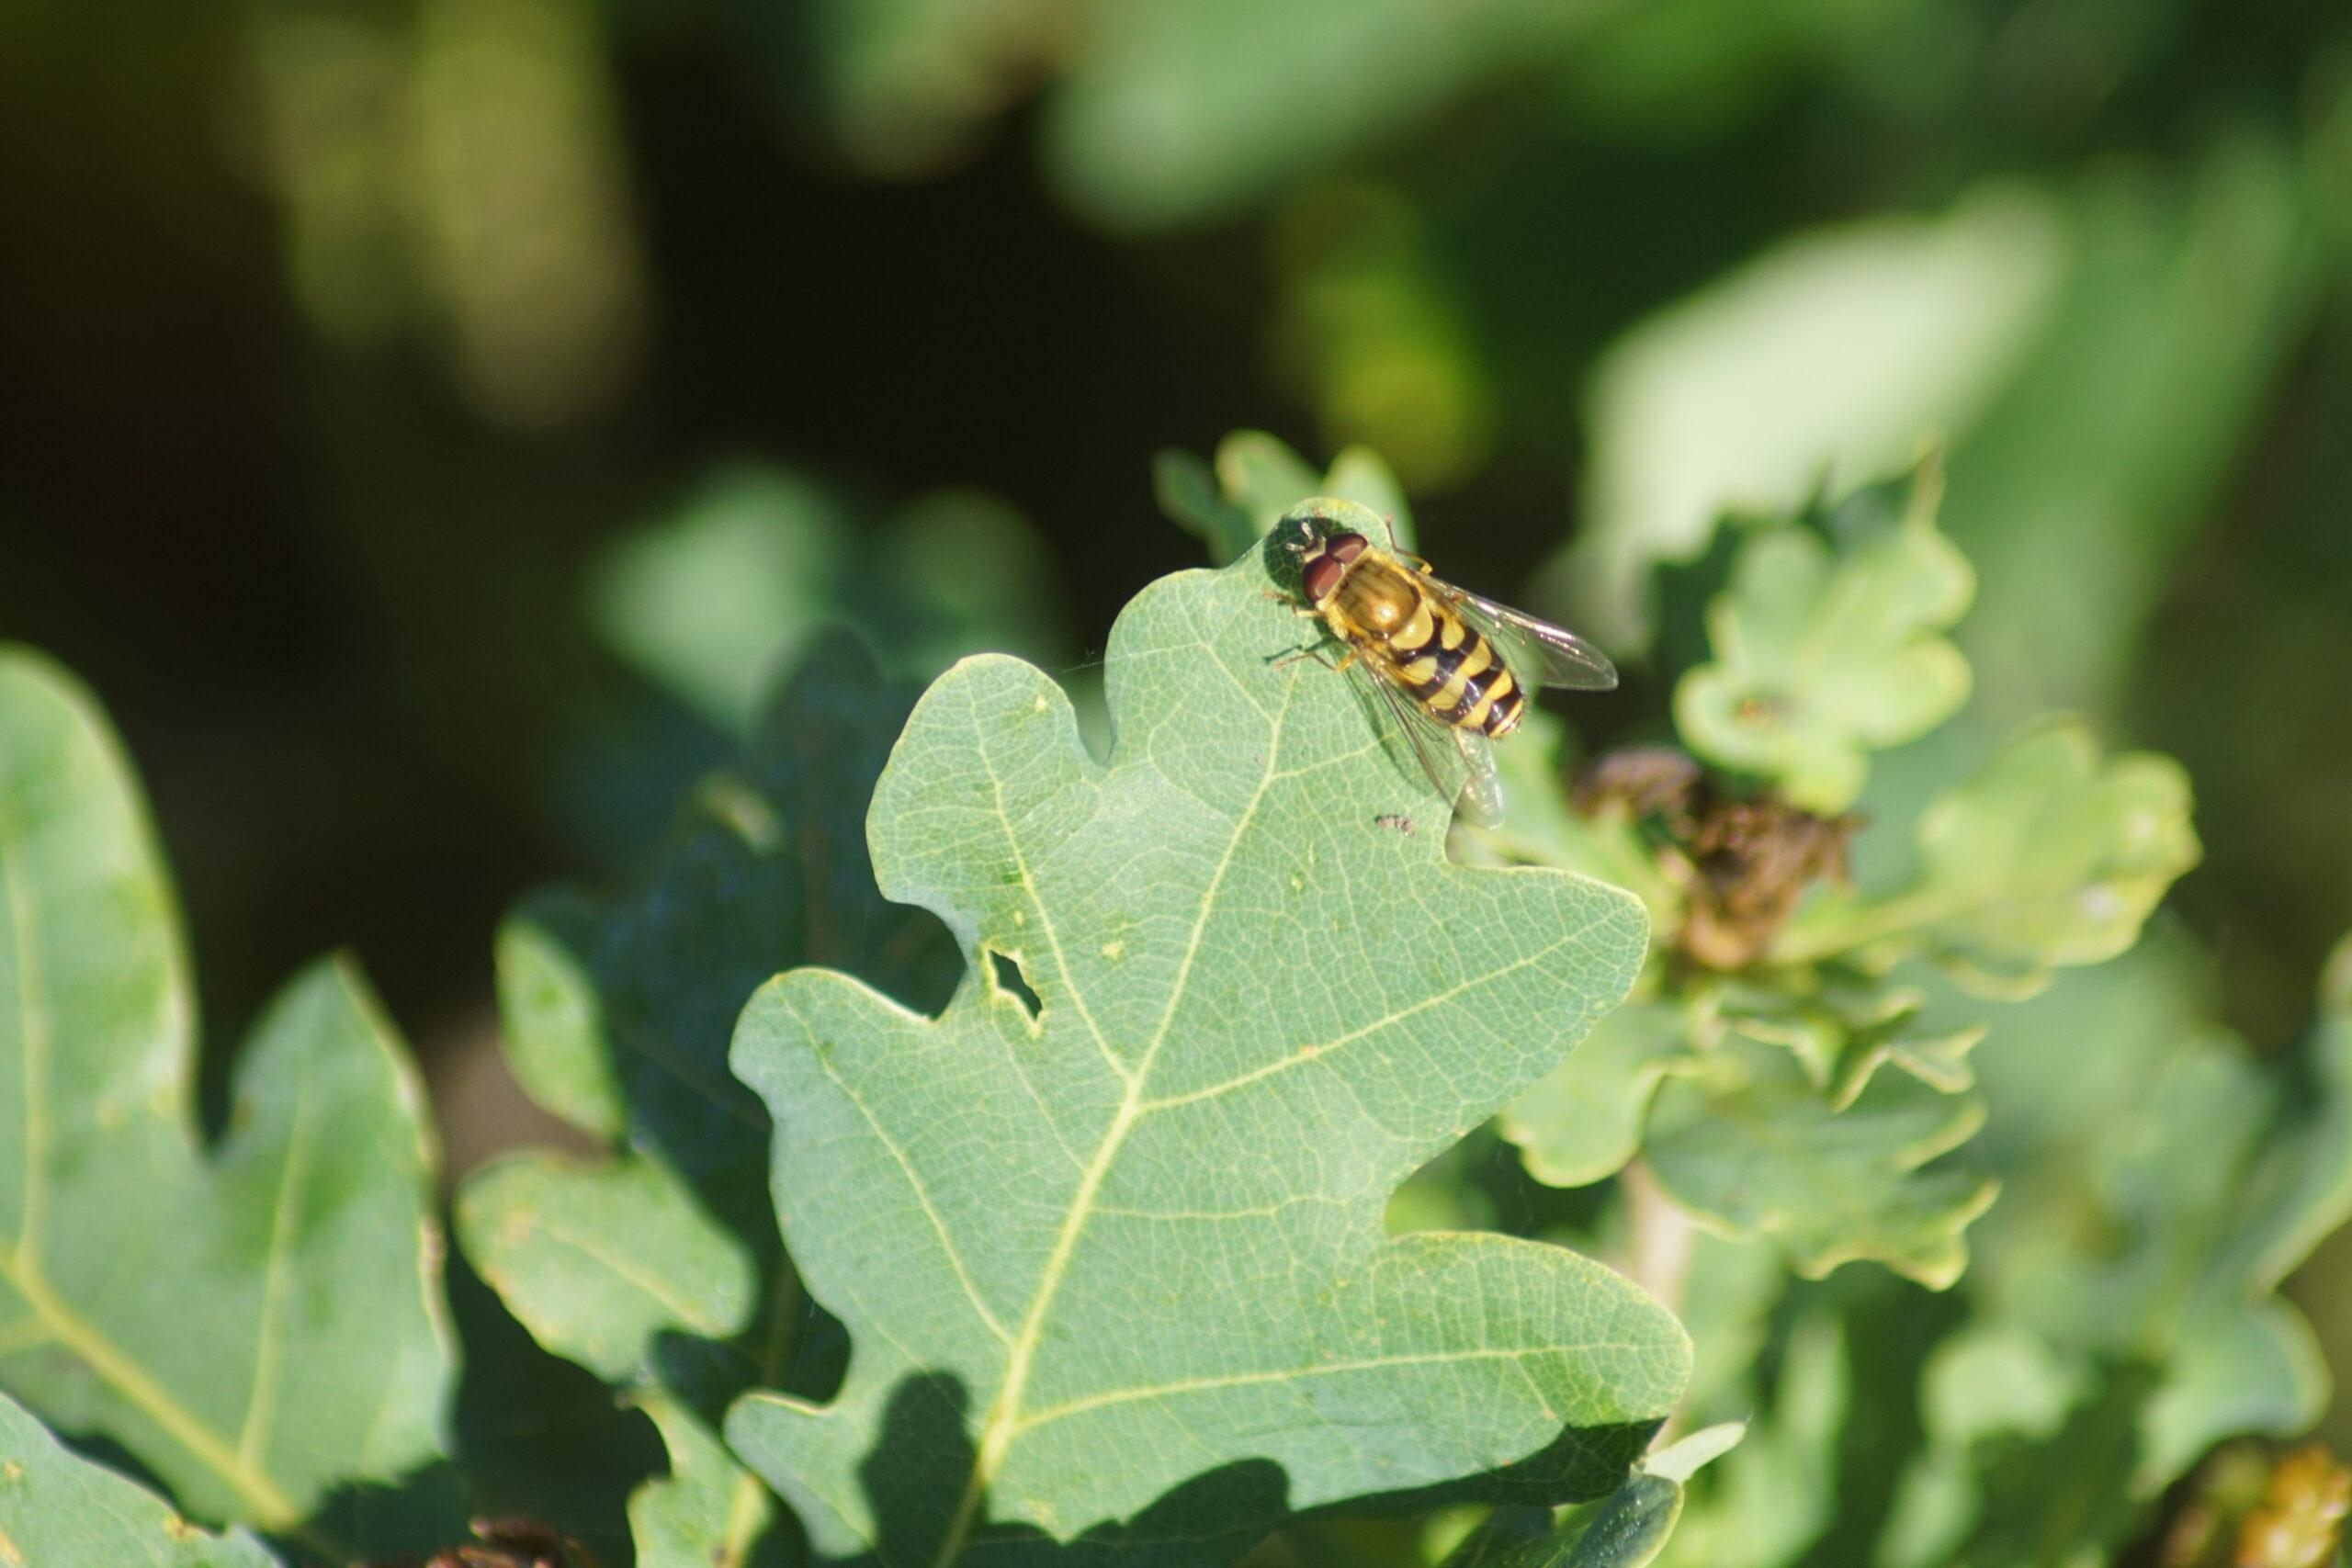 Hoverfly - Syrphus ribesii